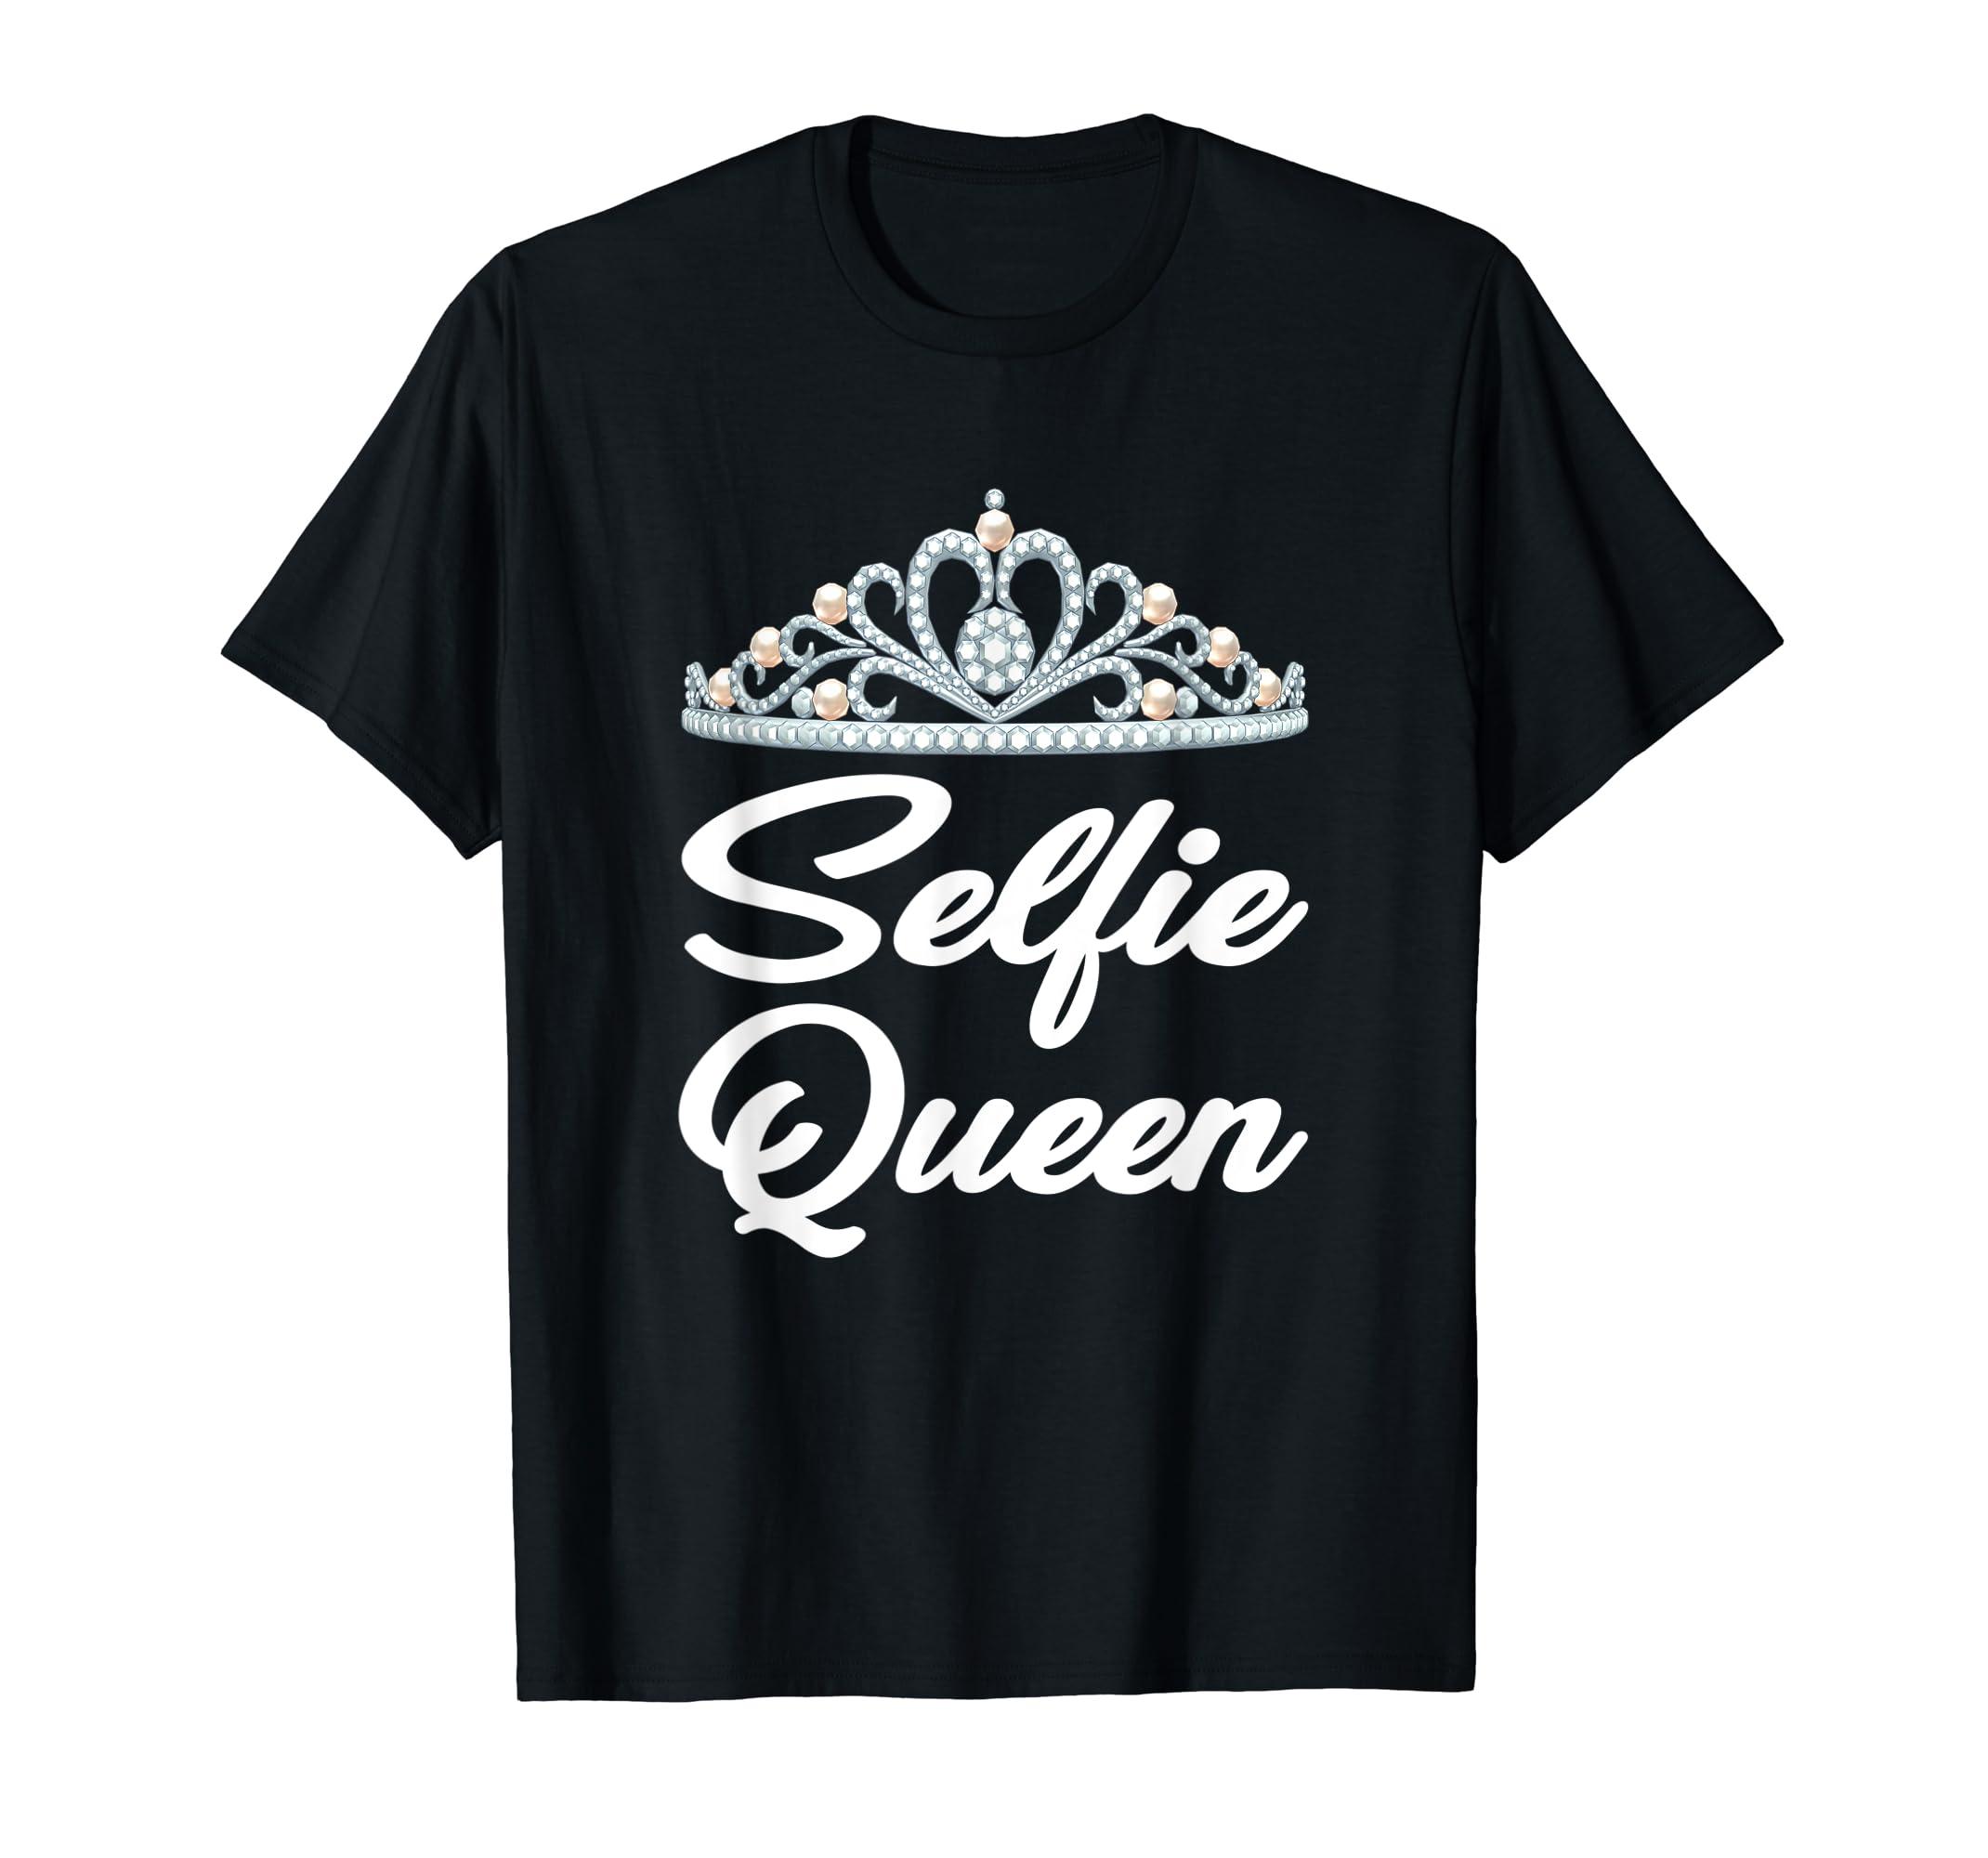 2bf6007aa Amazon.com: SELFIE QUEEN T SHIRT, Selfies, Funny T-Shirts Women's Teens:  Clothing